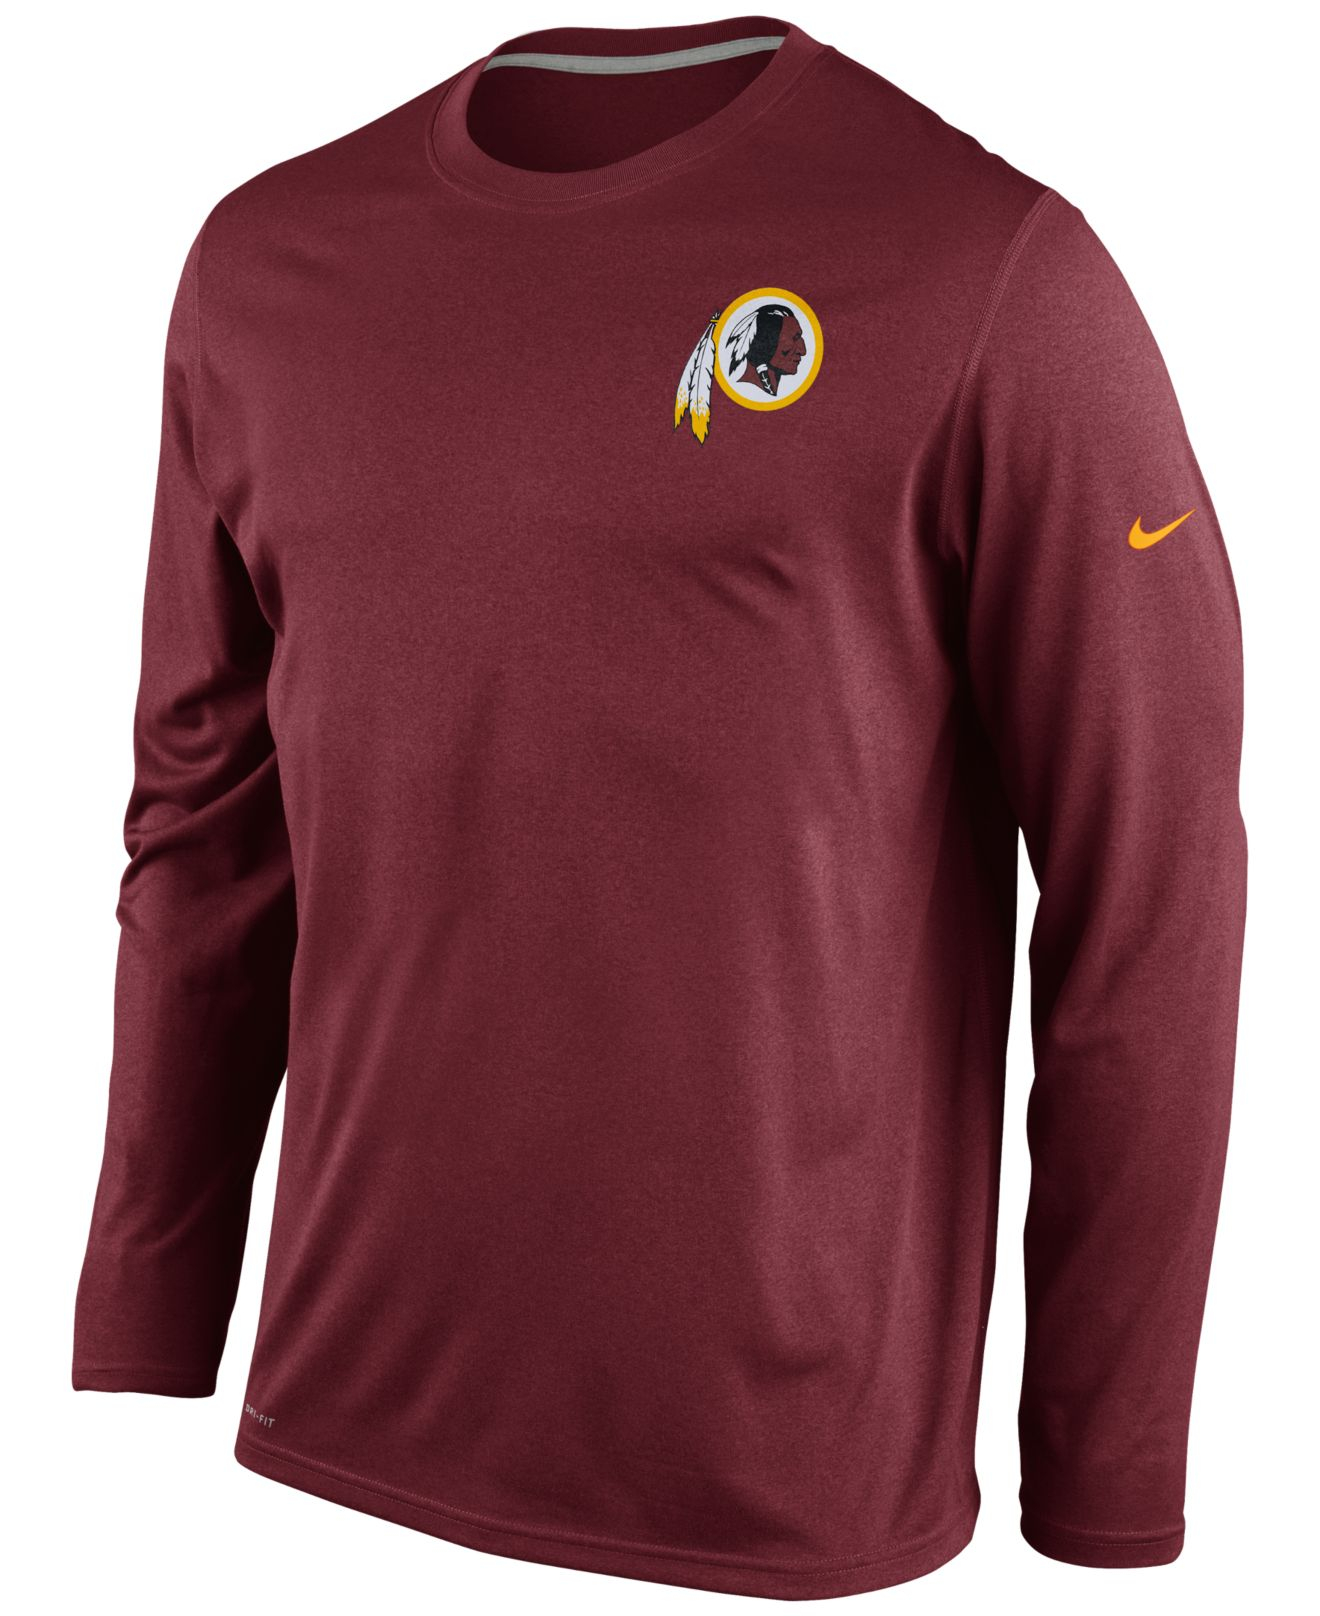 Nike Men 39 S Long Sleeve Washington Redskins Dri Fit T Shirt